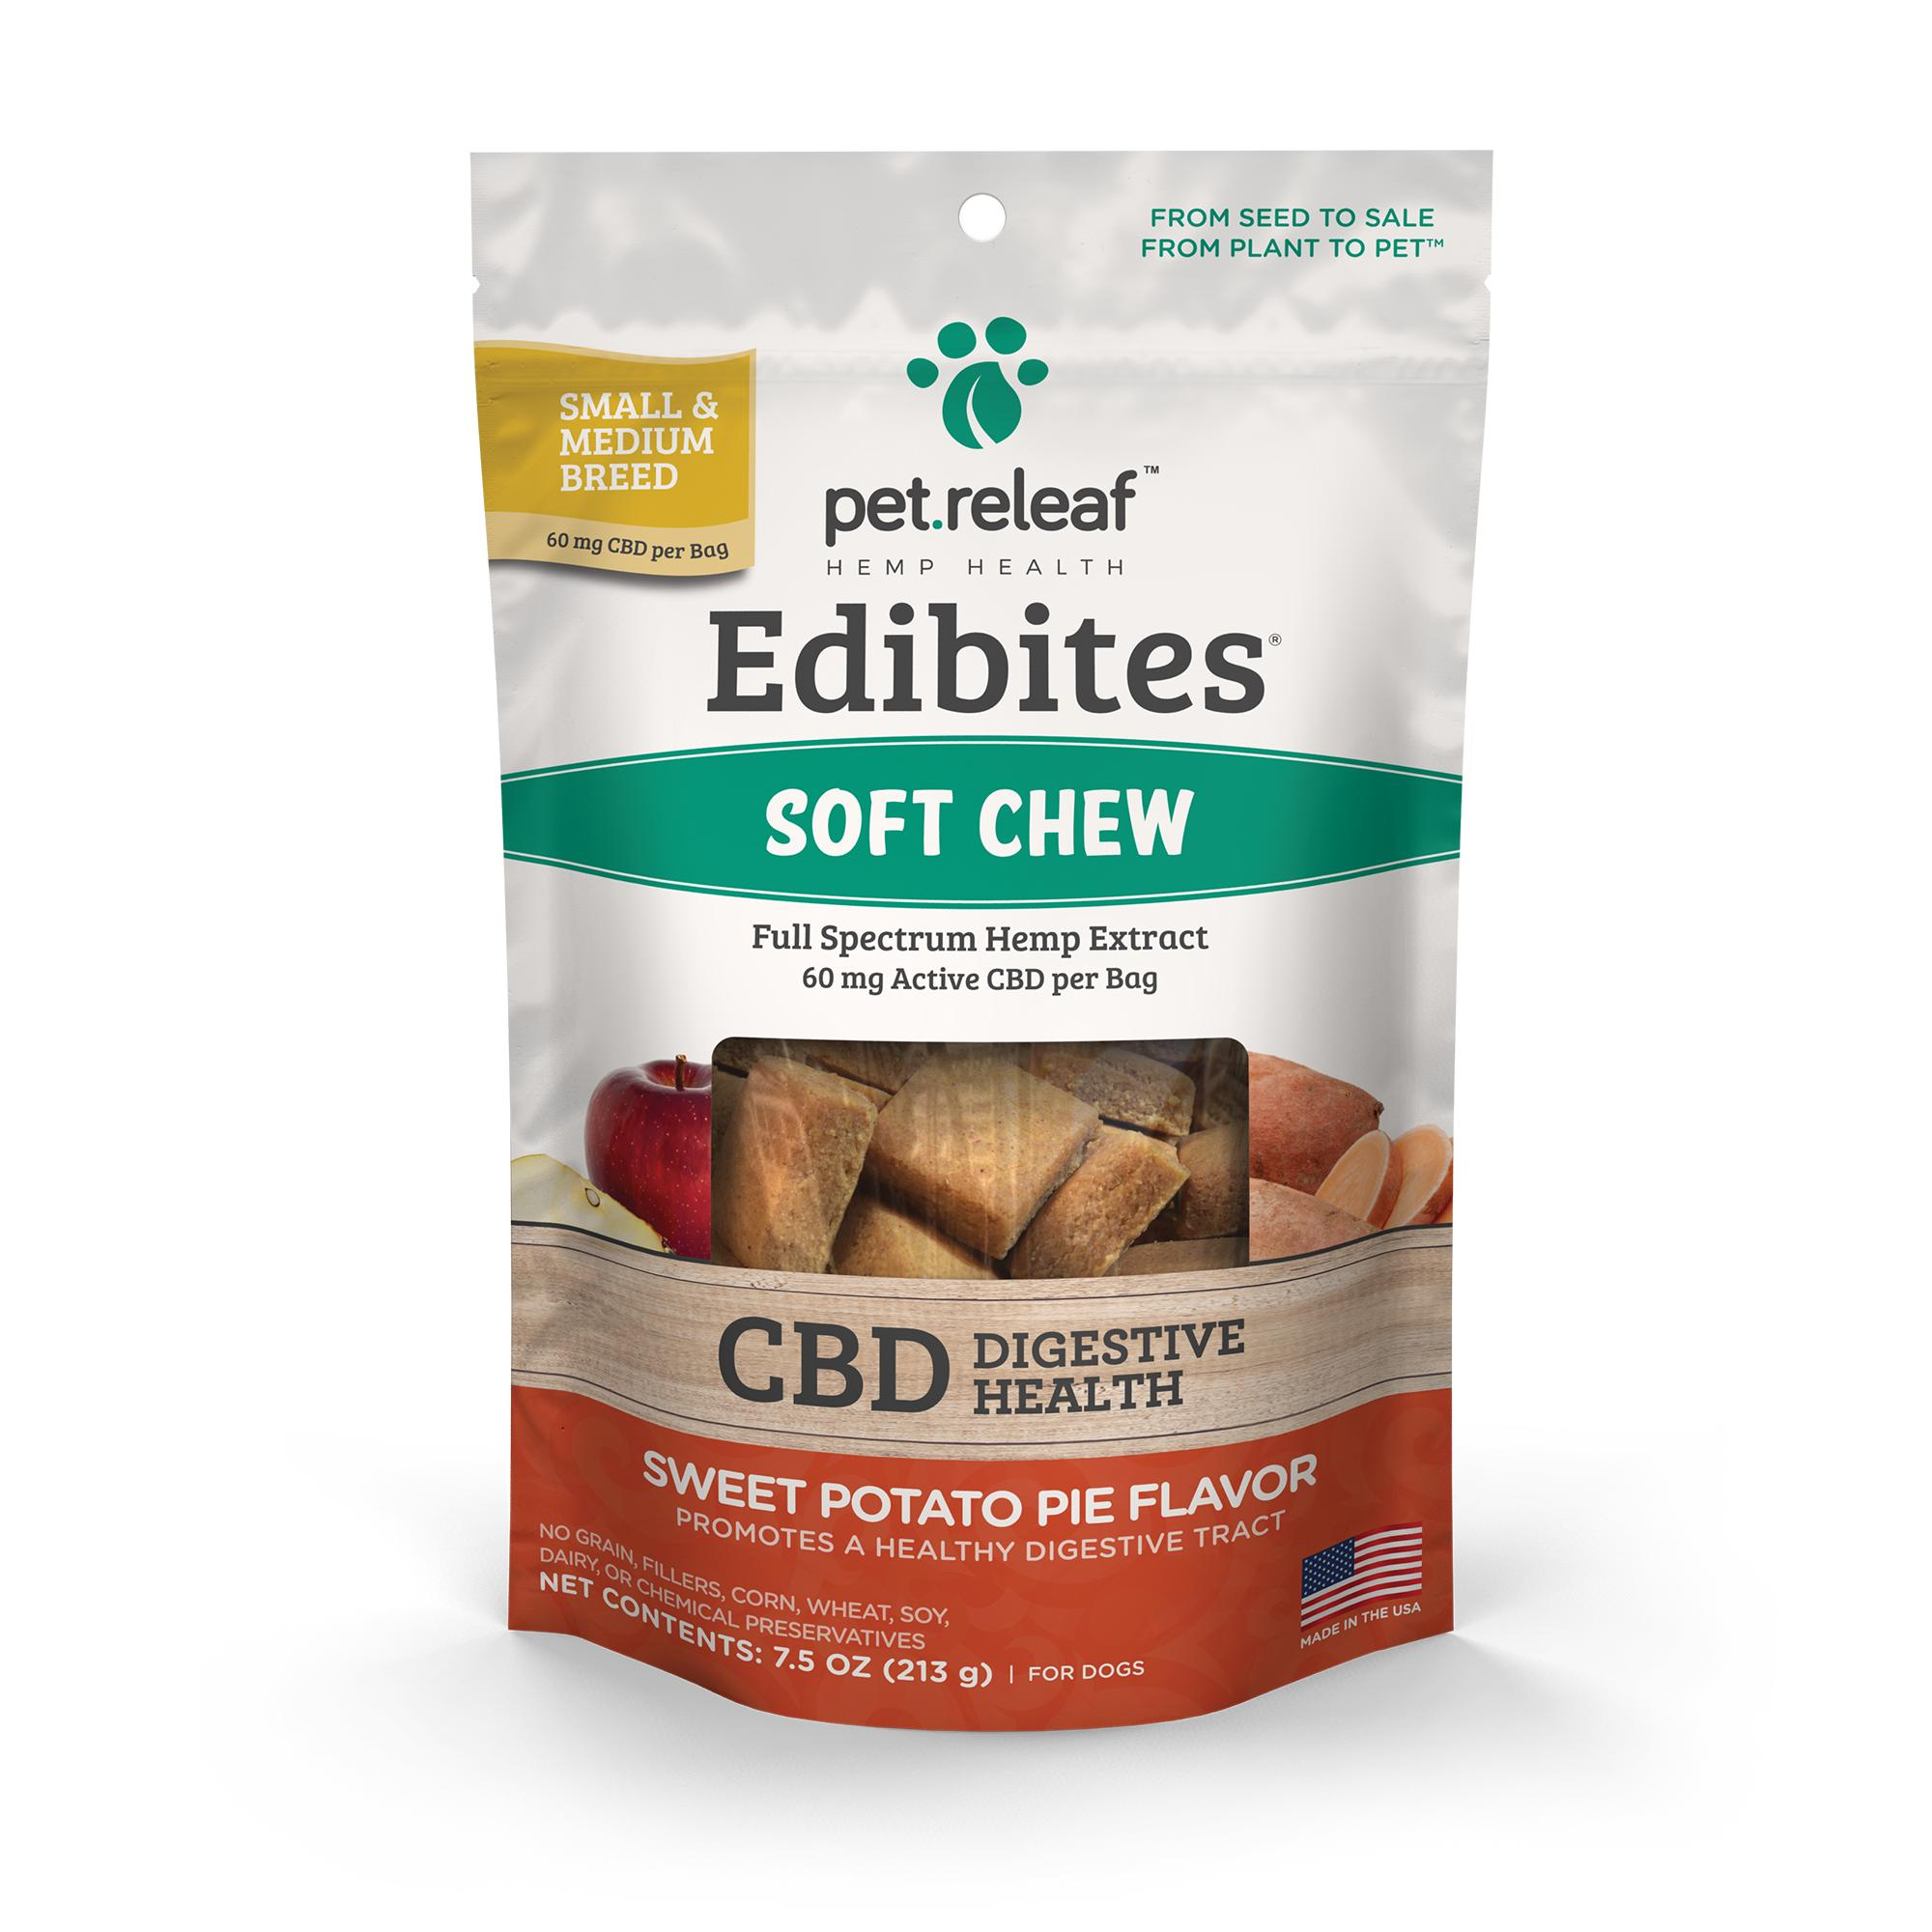 Pet Releaf Edibites Soft Chew Digestive Health Sweet Potato Small & Medium Breed Dog Supplement, 7.5-oz